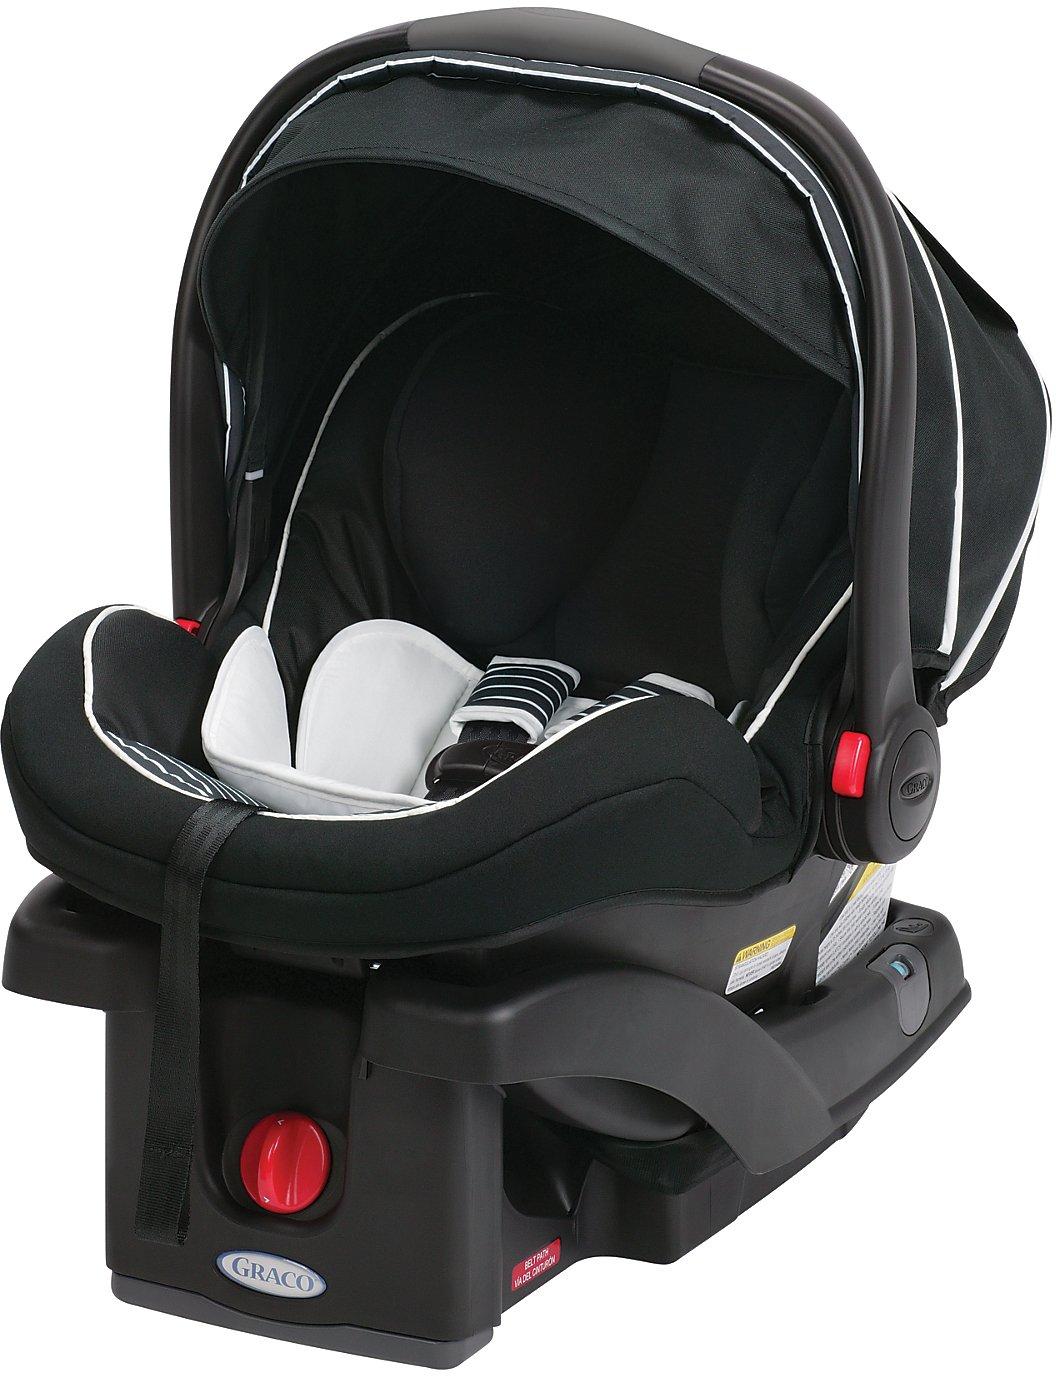 graco snugride click connect 30 35 lx infant car seat base black baby. Black Bedroom Furniture Sets. Home Design Ideas